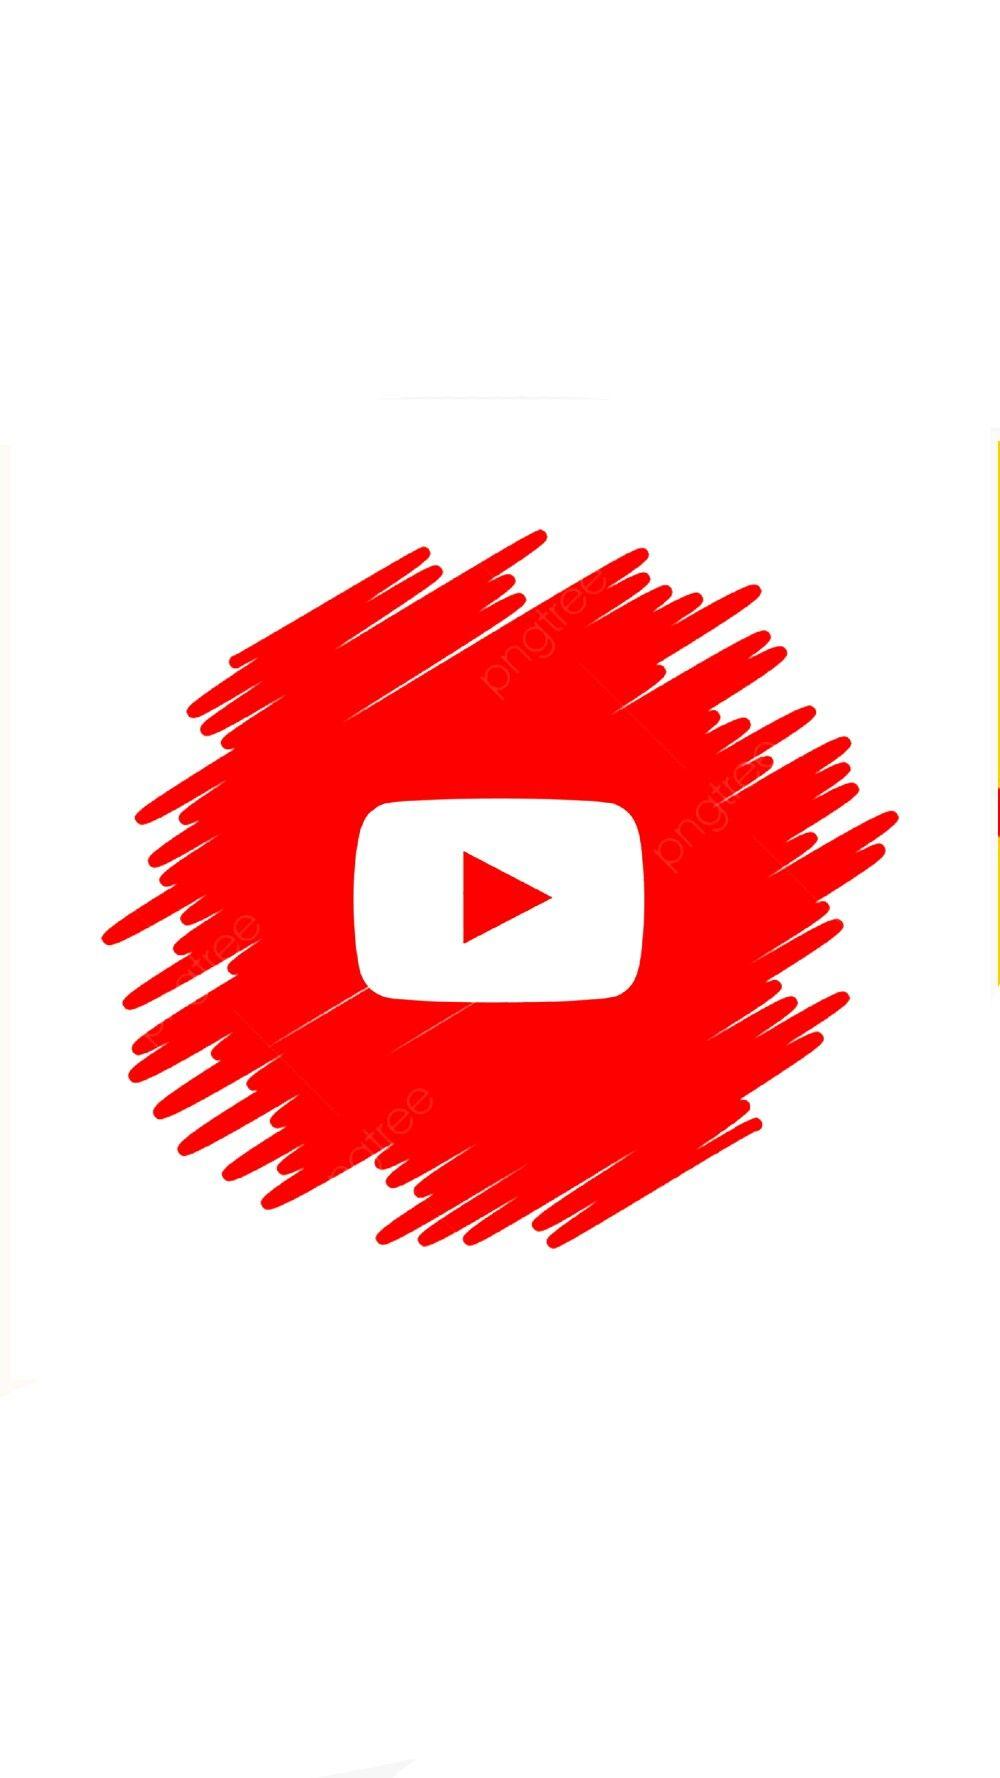 Youtube Brush Wallpaper Youtube Logo Youtube Video Ads Youtube Logo Png